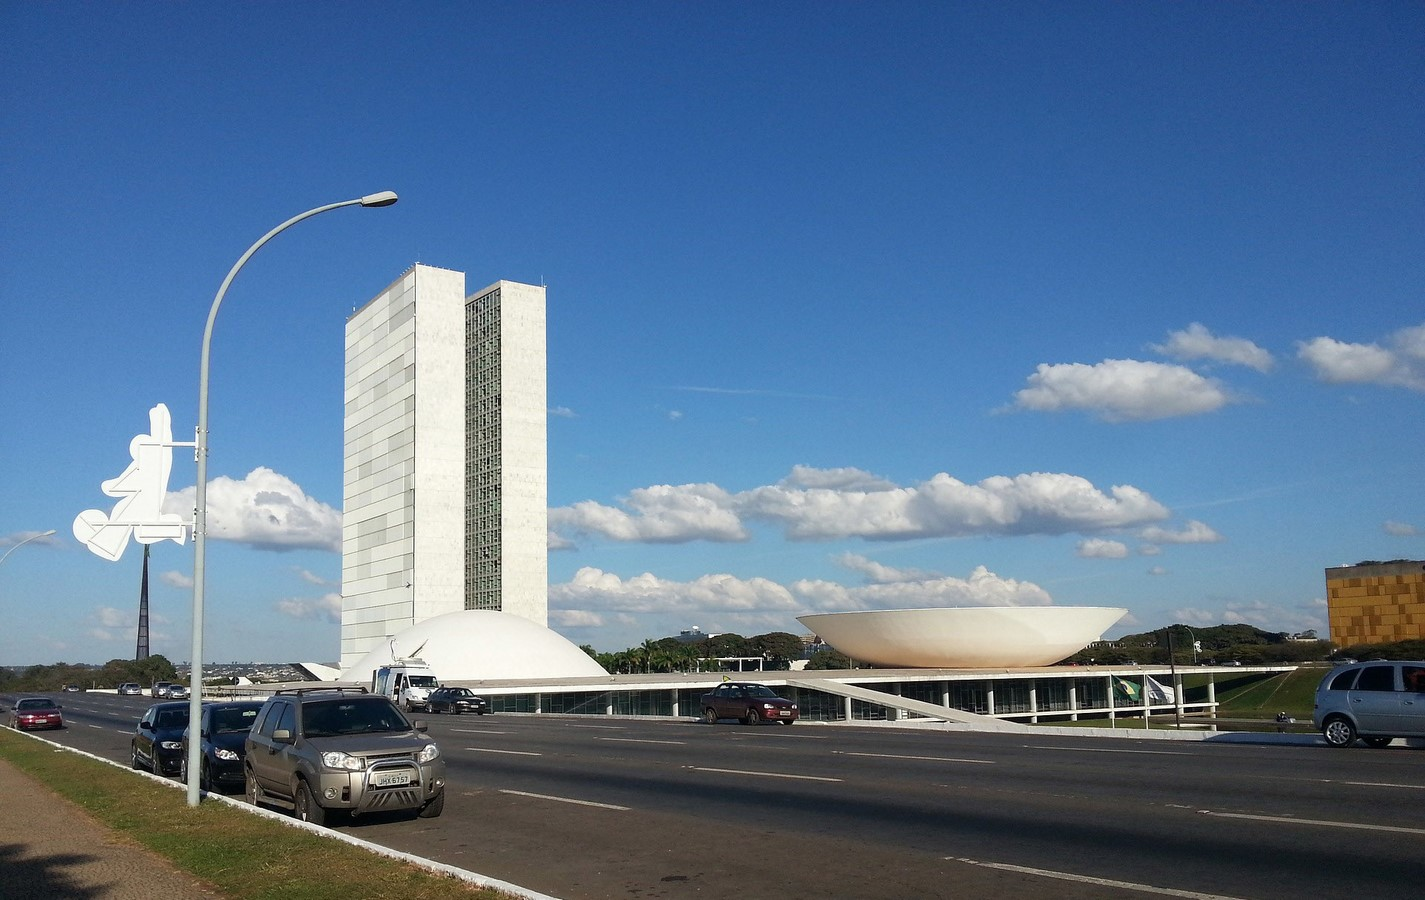 Architecture in Brasilia - Sheet1